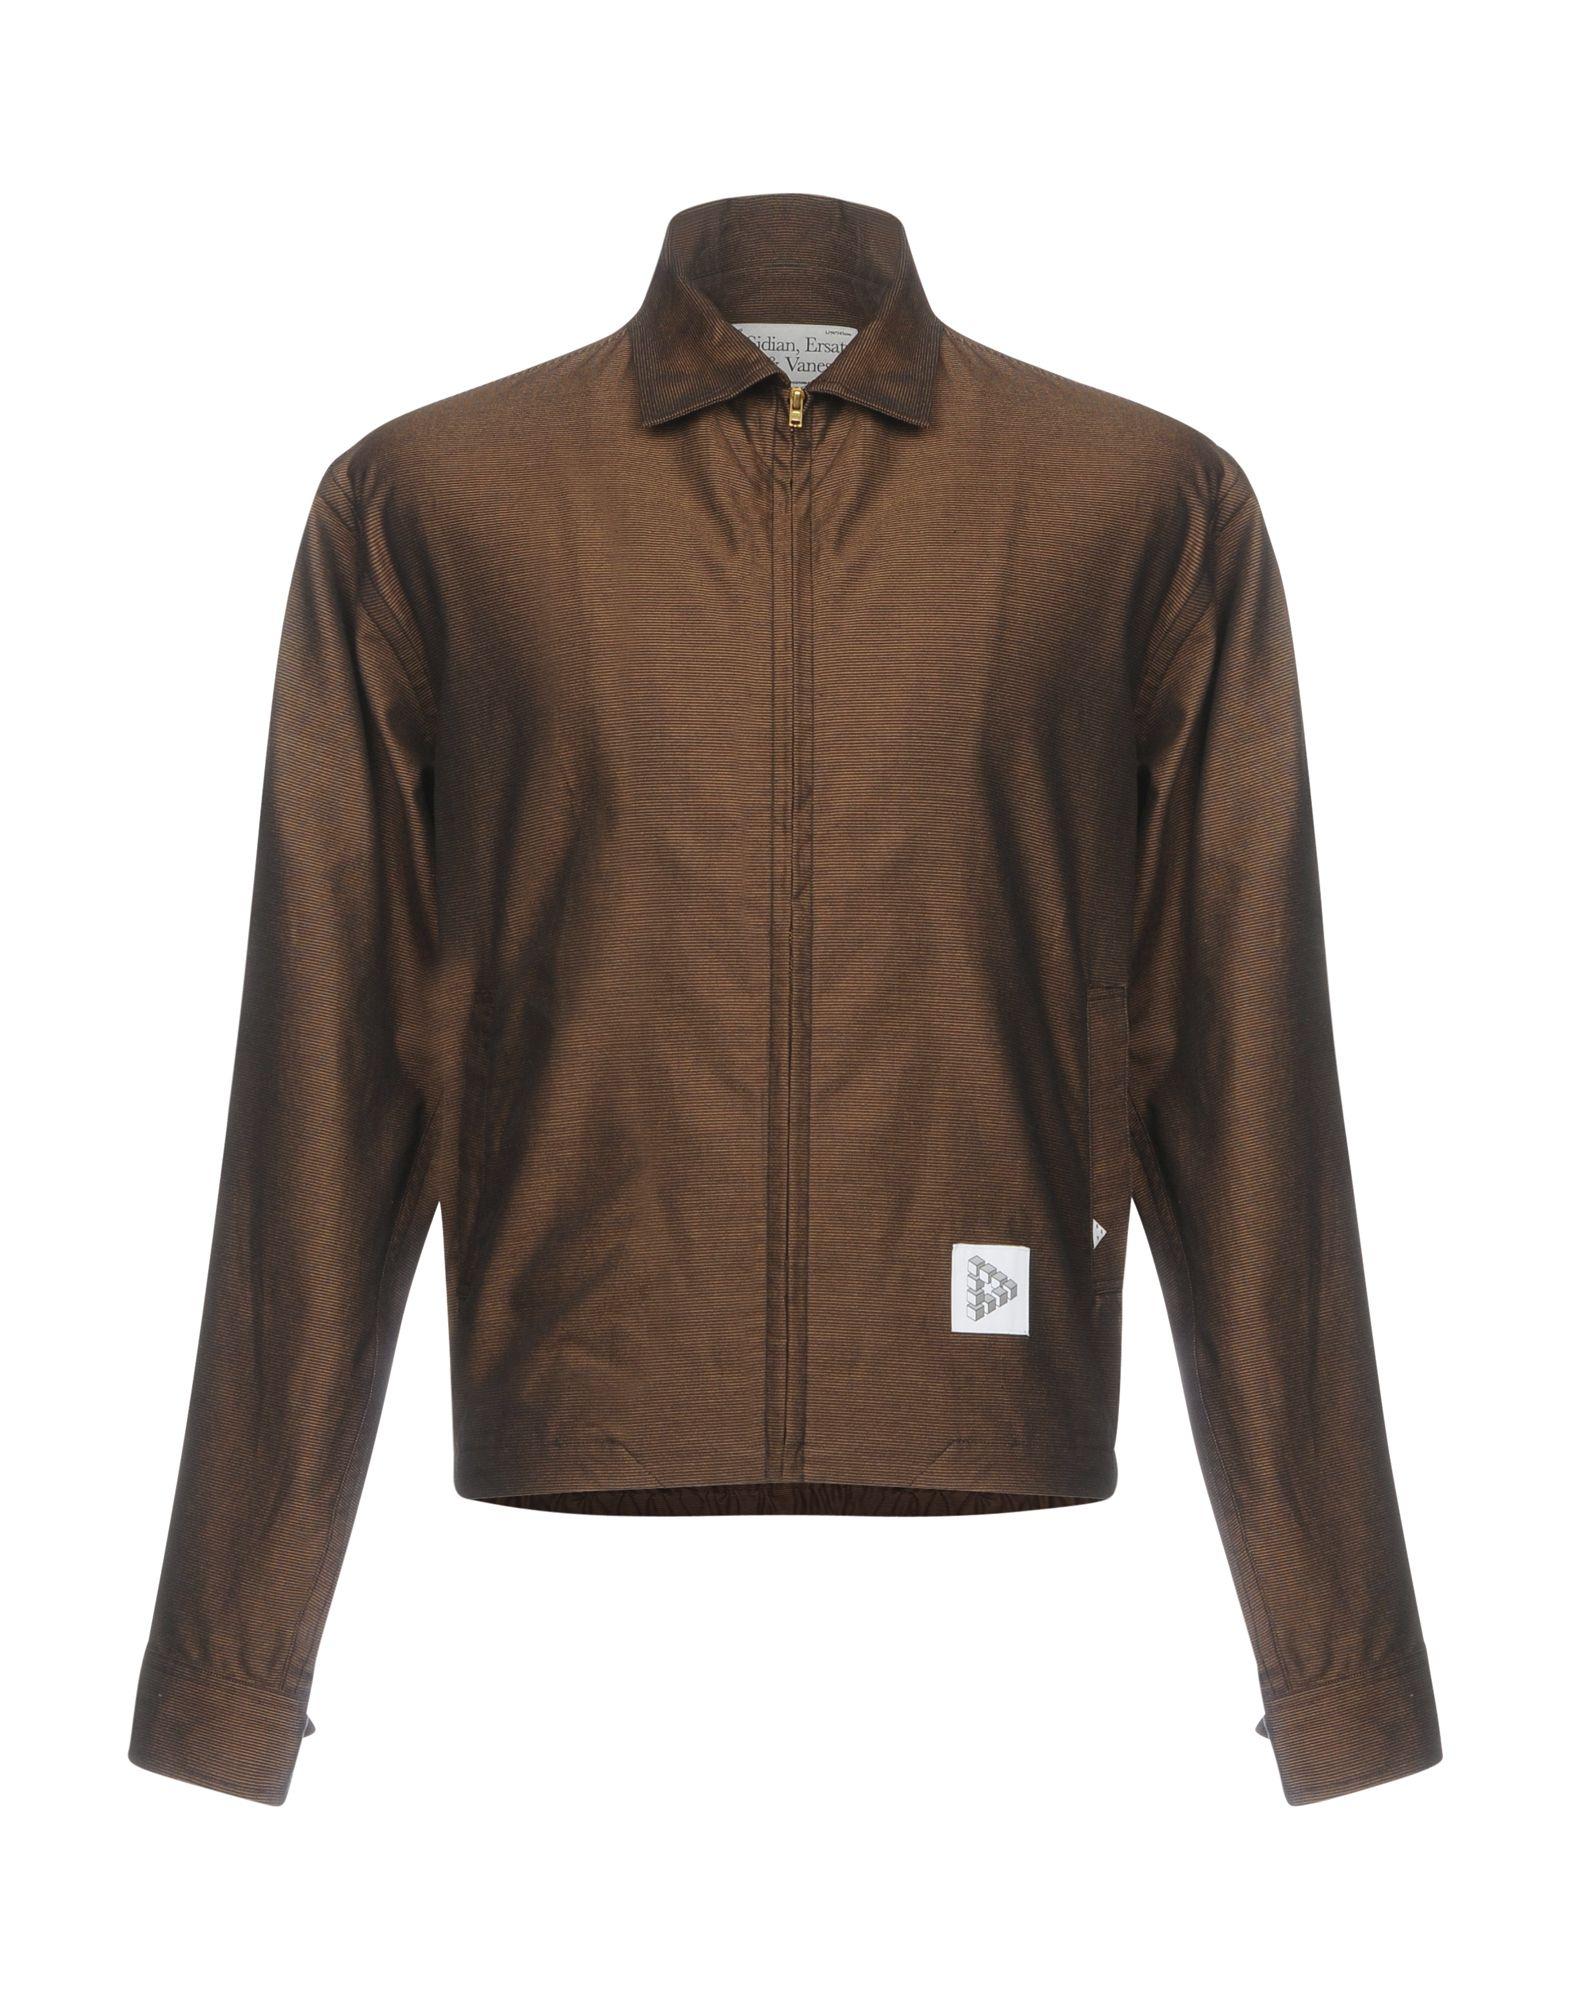 SIDIAN, ERSATZ & VANES Jacket in Dark Brown